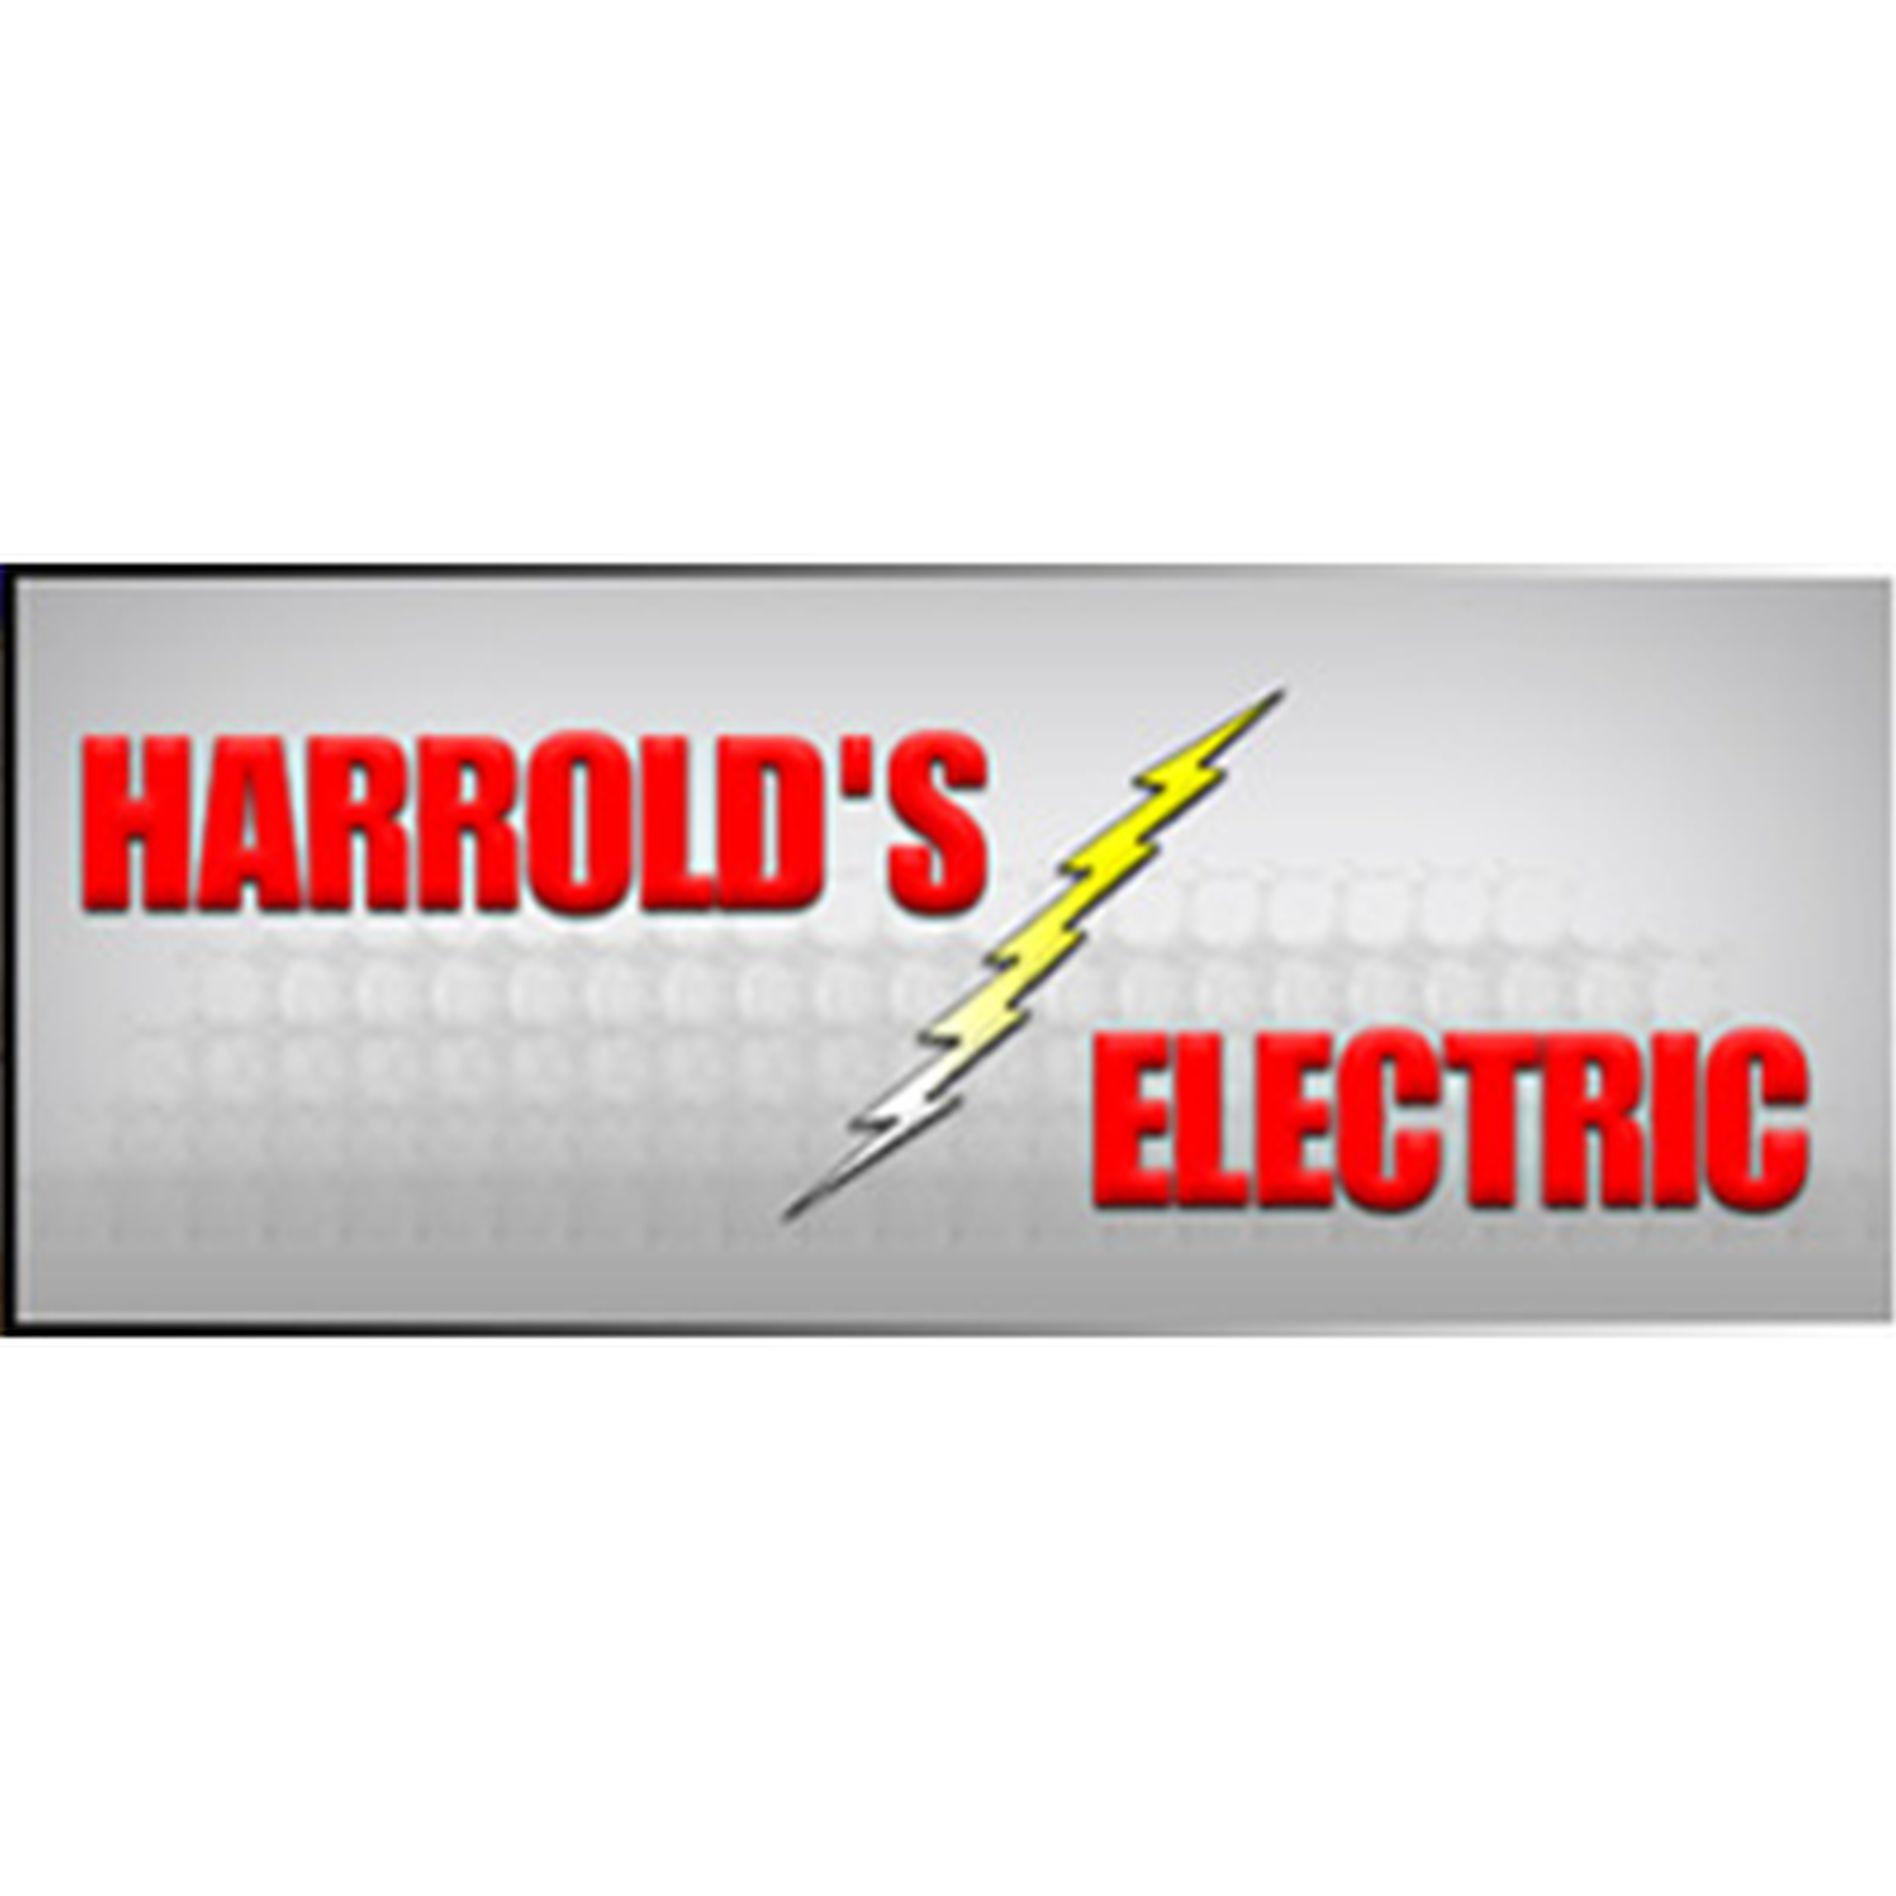 Harrold's Electric Ness City, KS 67560 - YP com